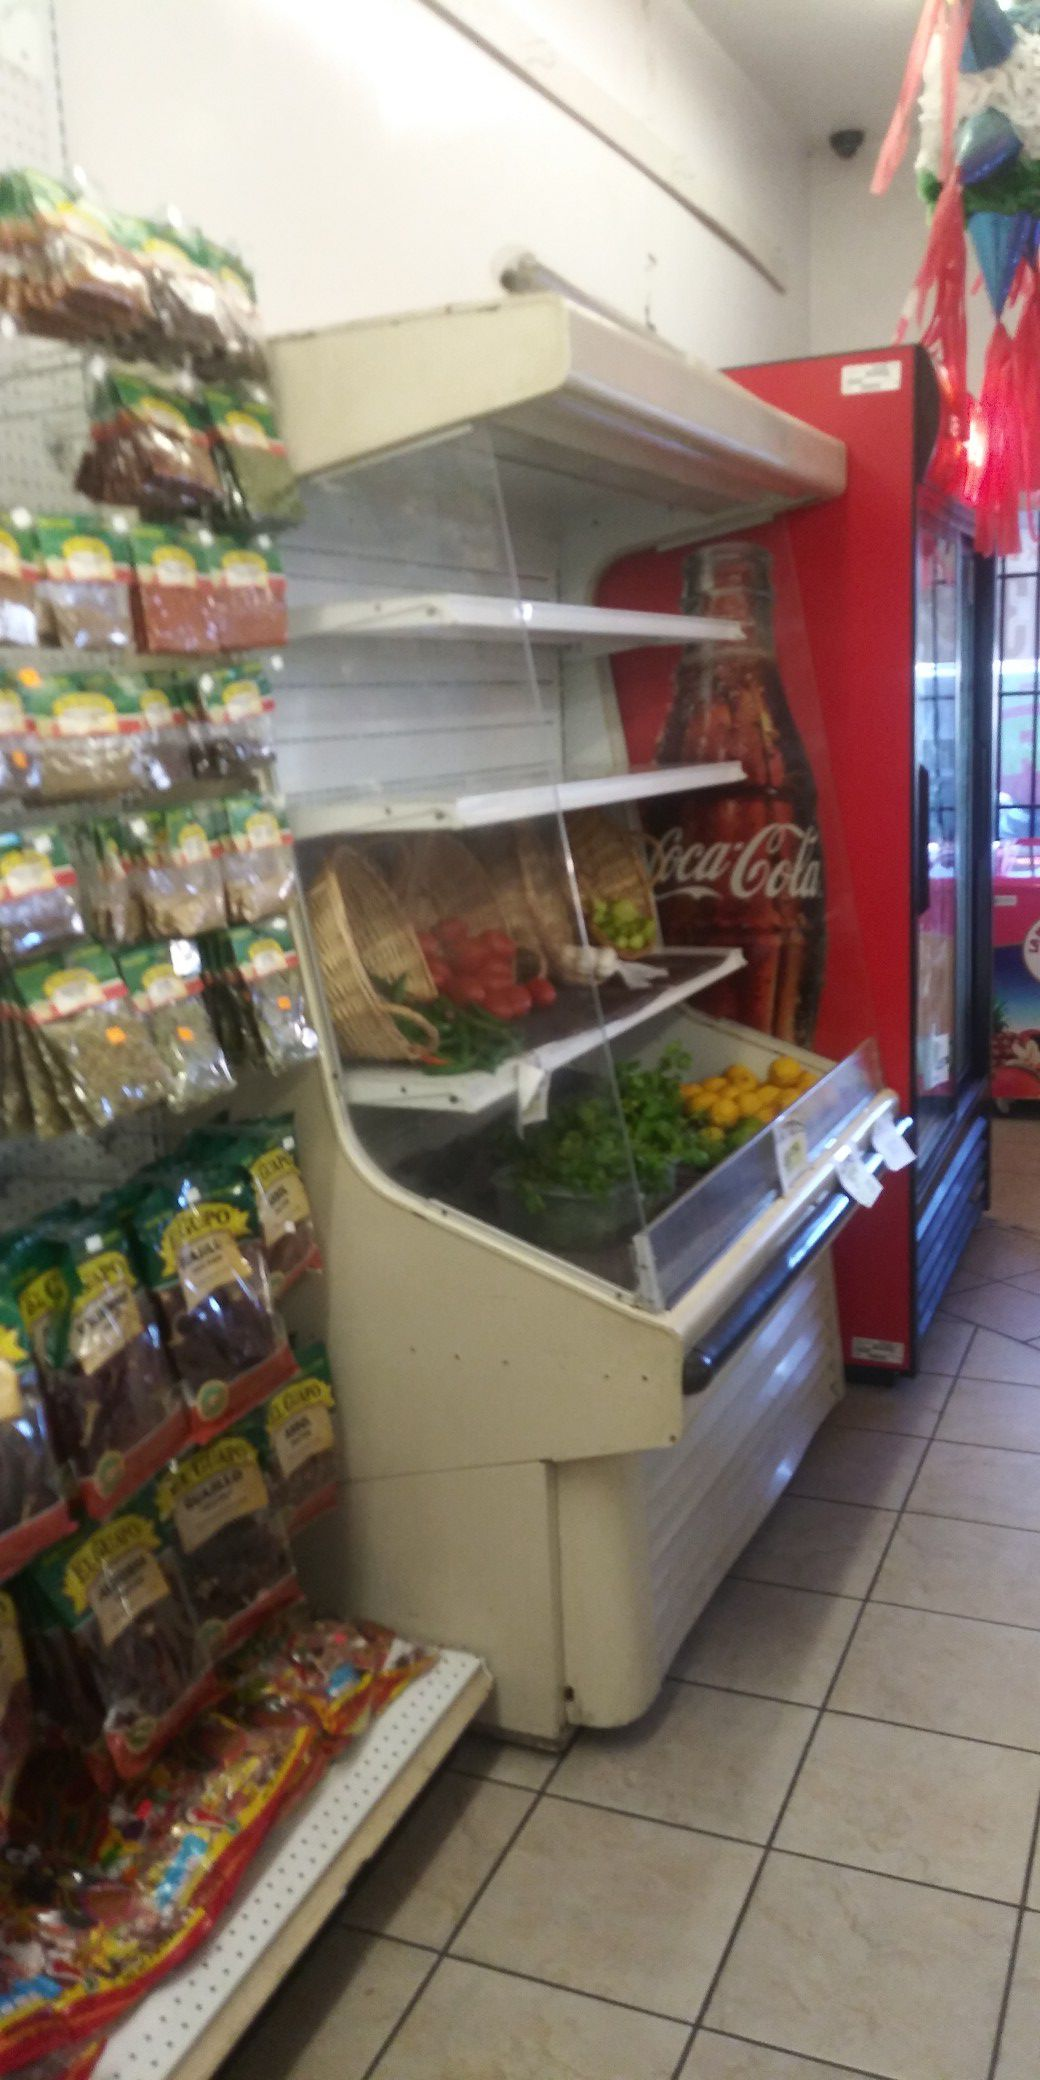 Product refrigerator